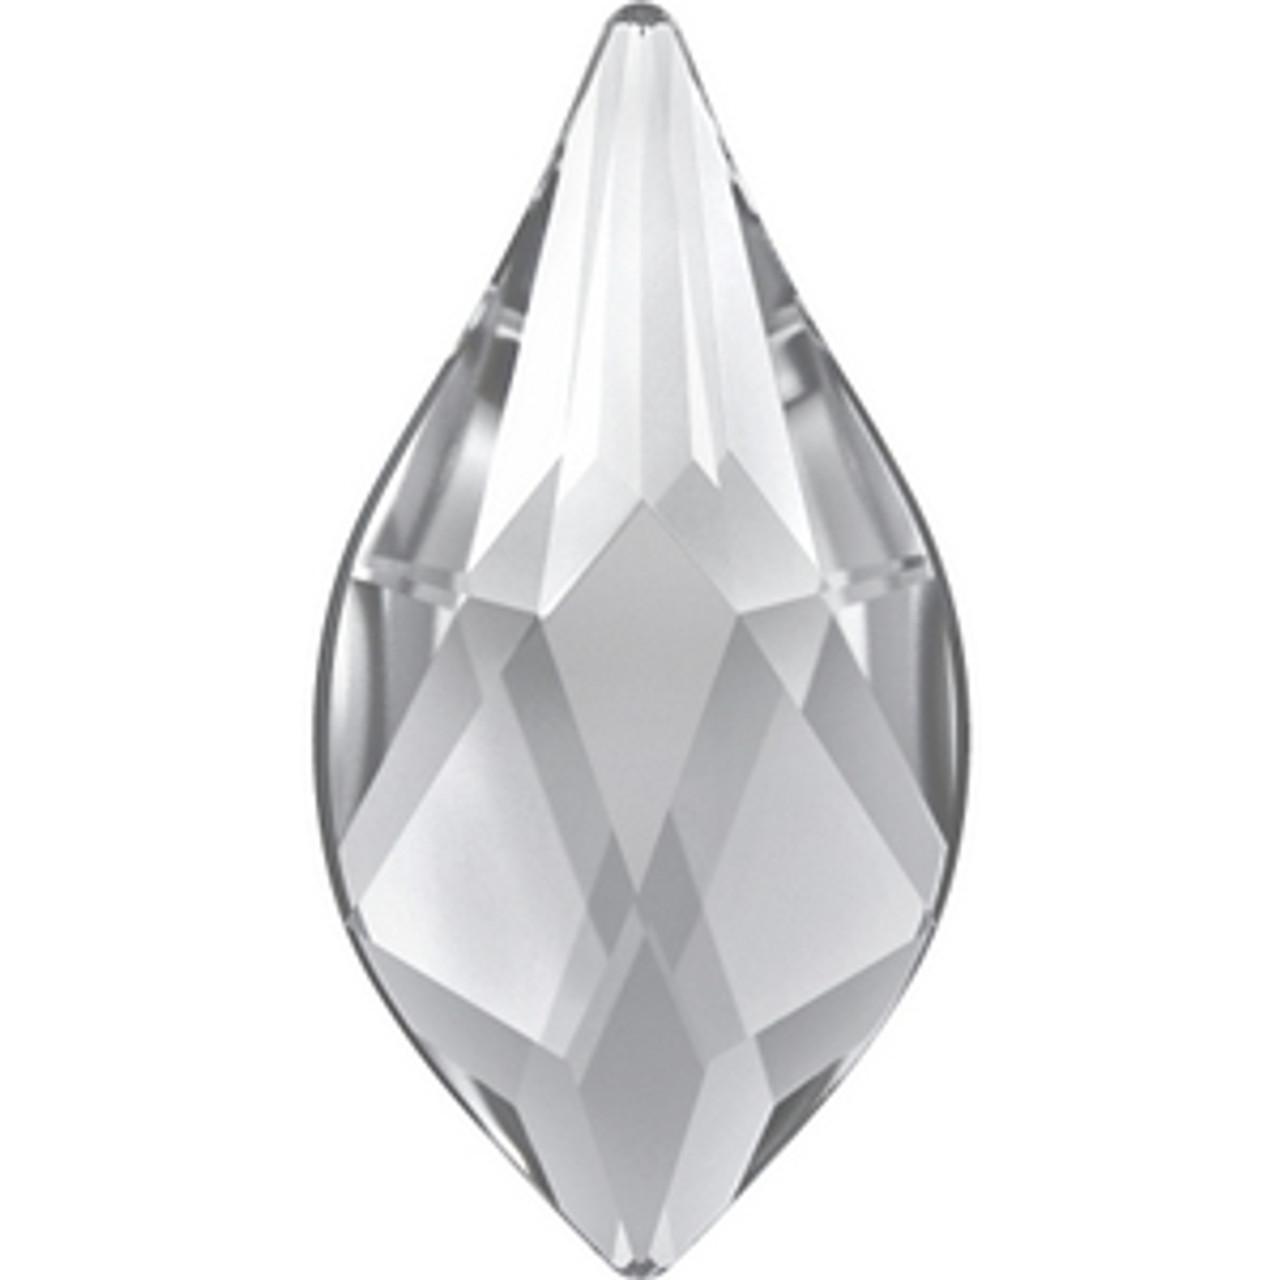 comfortable feel speical offer sale online Swarovski 2205 14mm Flame Flatback Crystal Hot Fix (72 pieces )